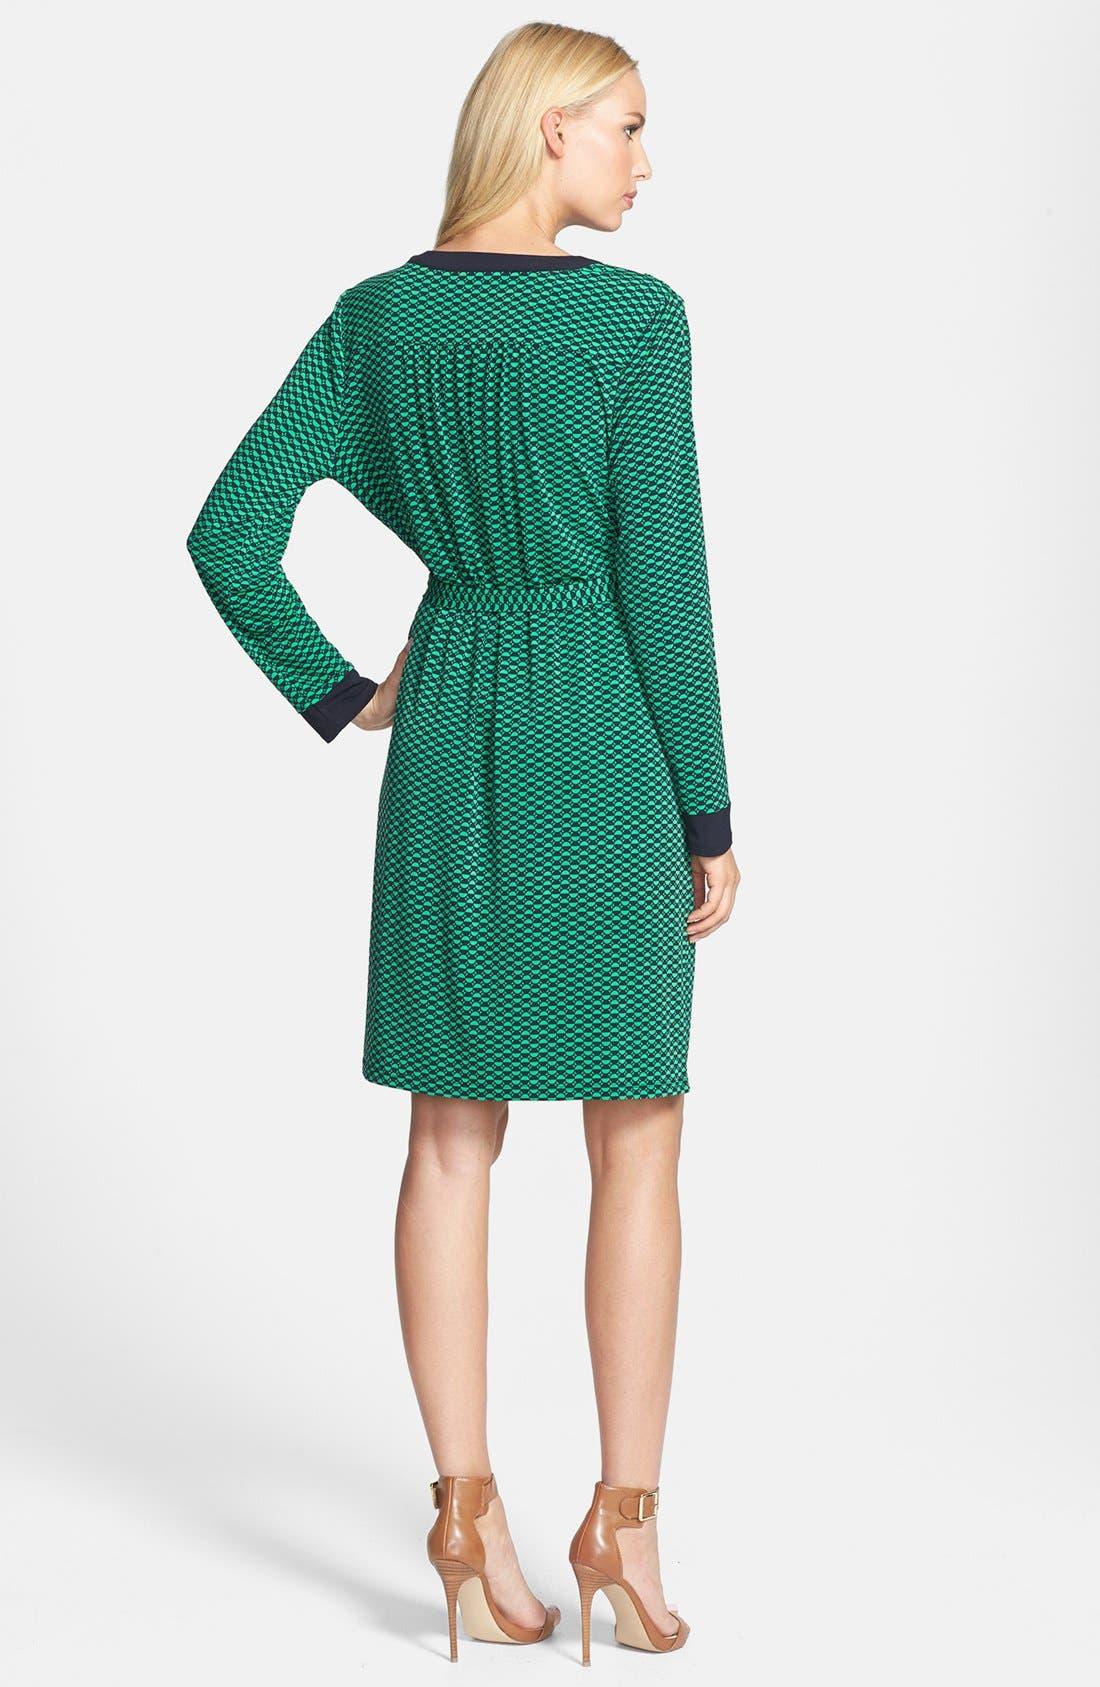 Alternate Image 2  - MICHAEL Michael Kors Lace Up Belted Knit Dress (Regular & Petite)